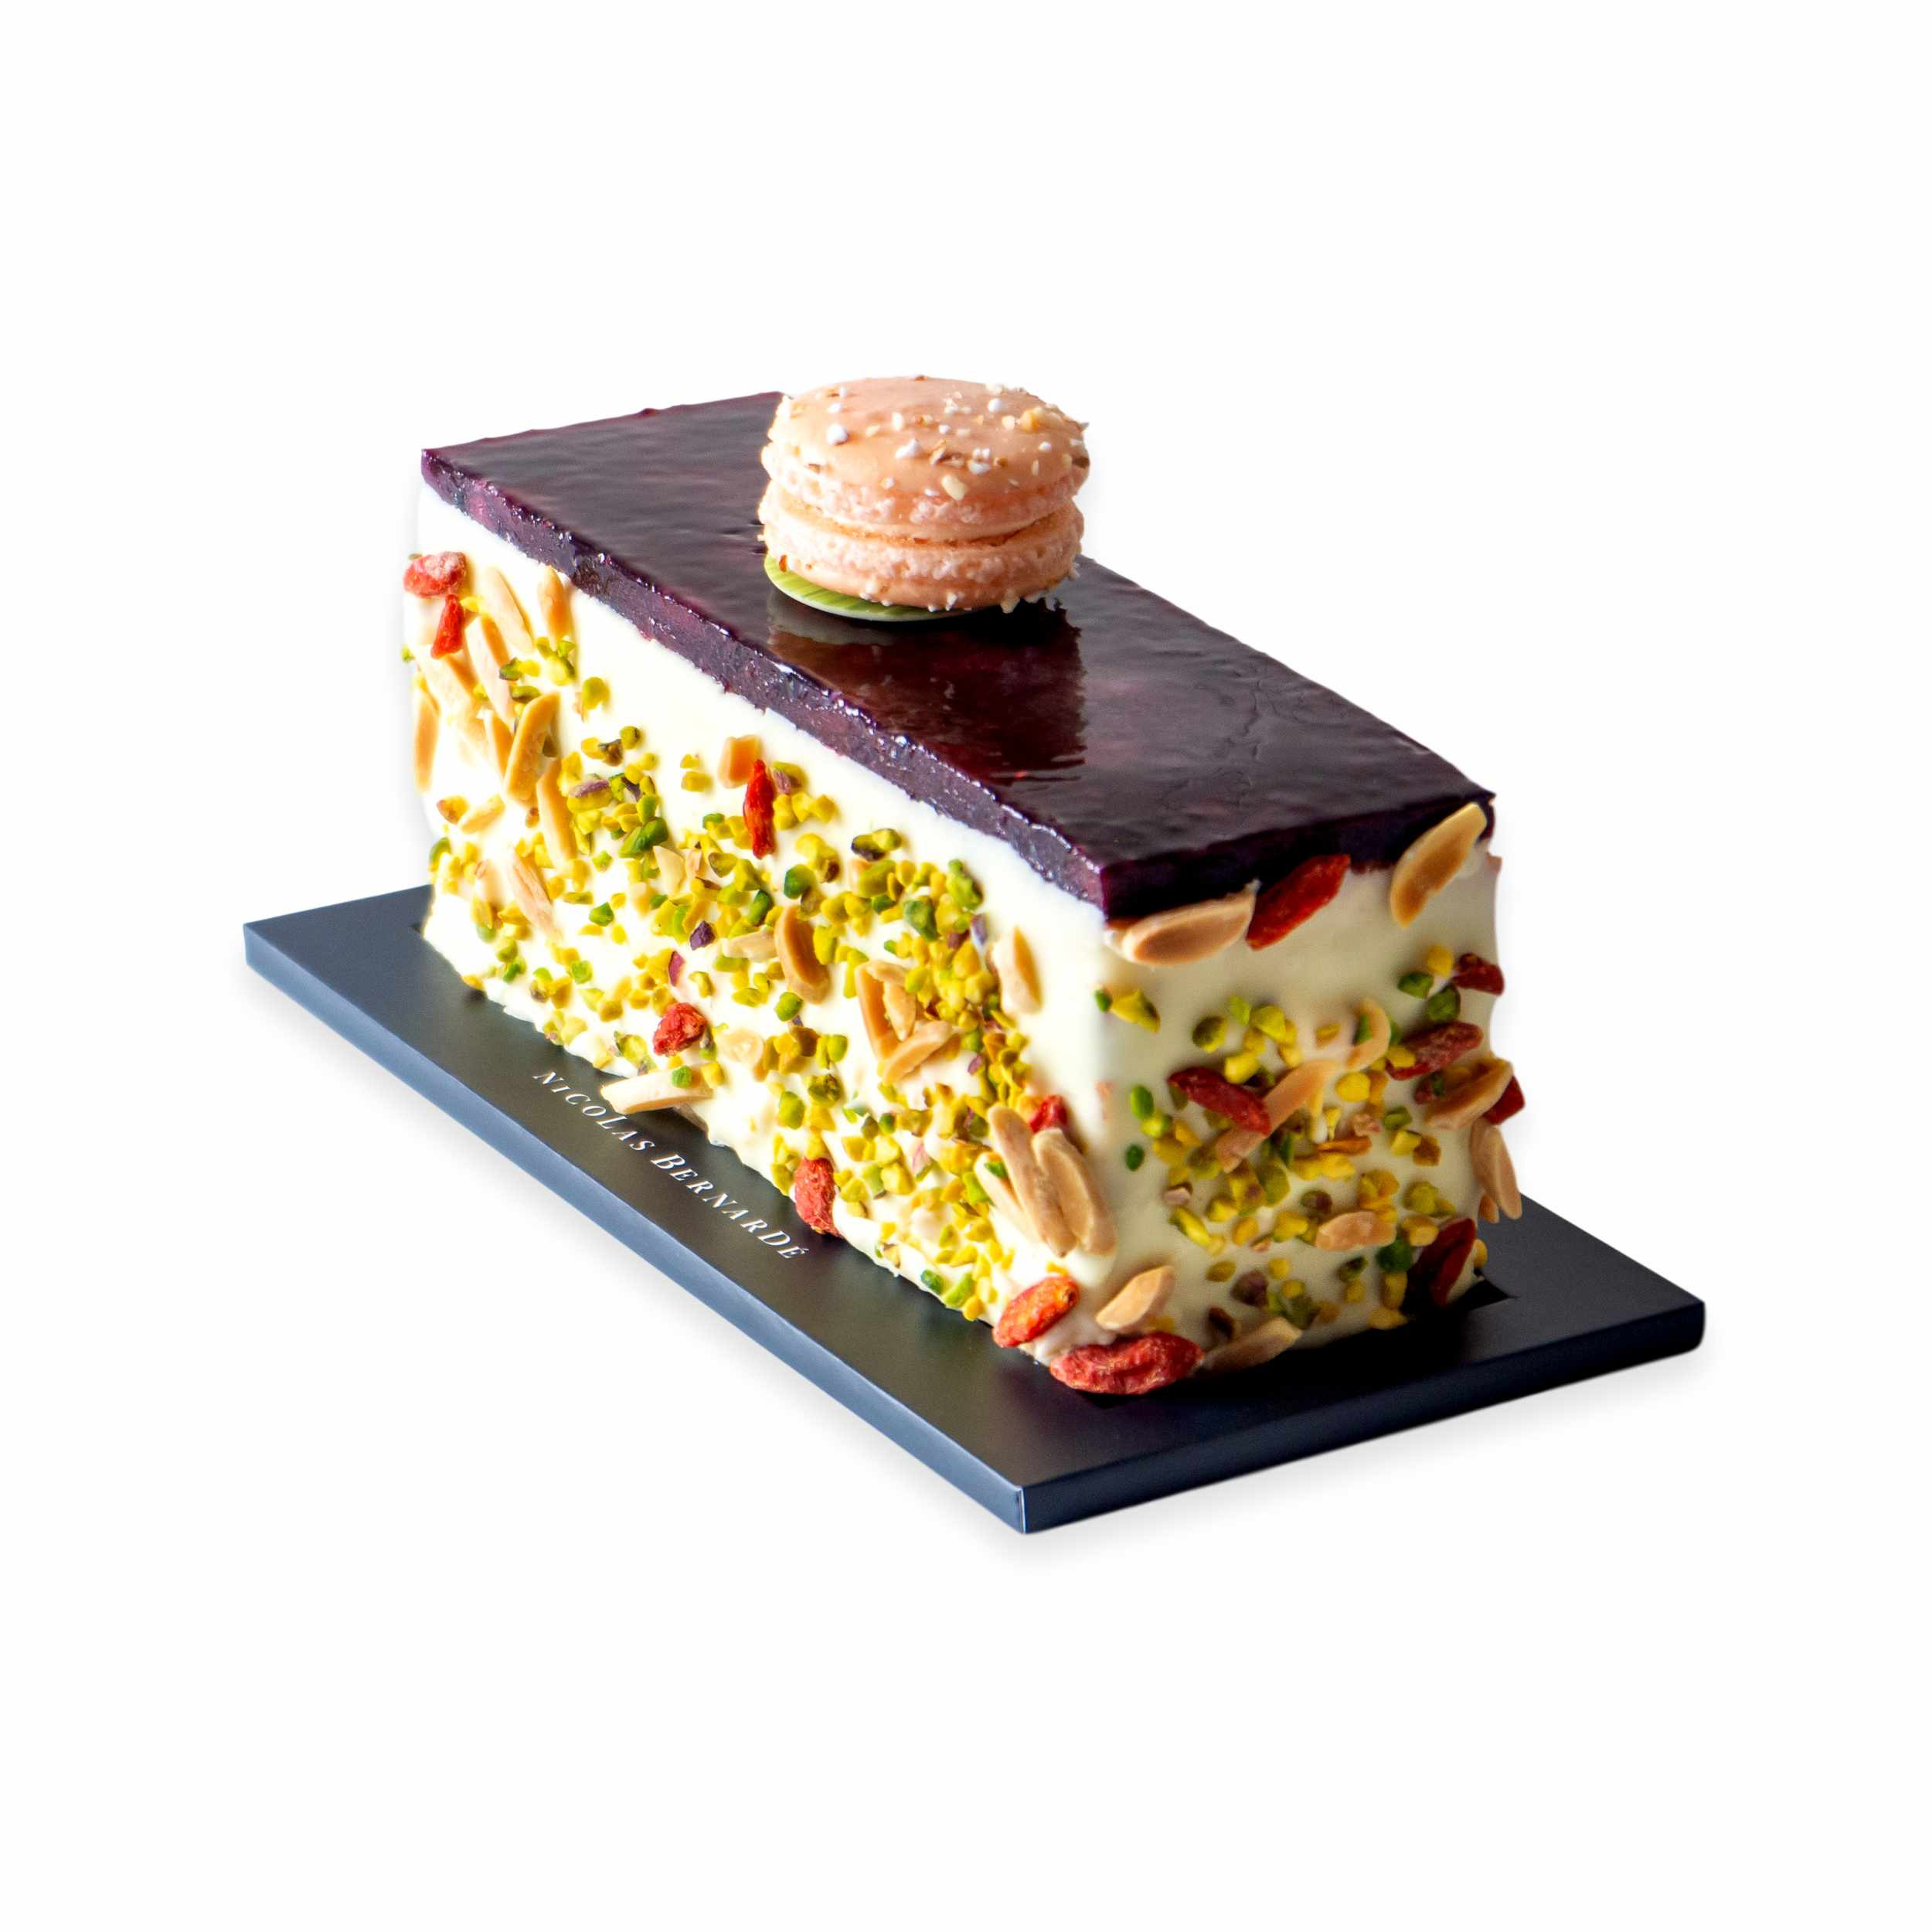 cake-1010450